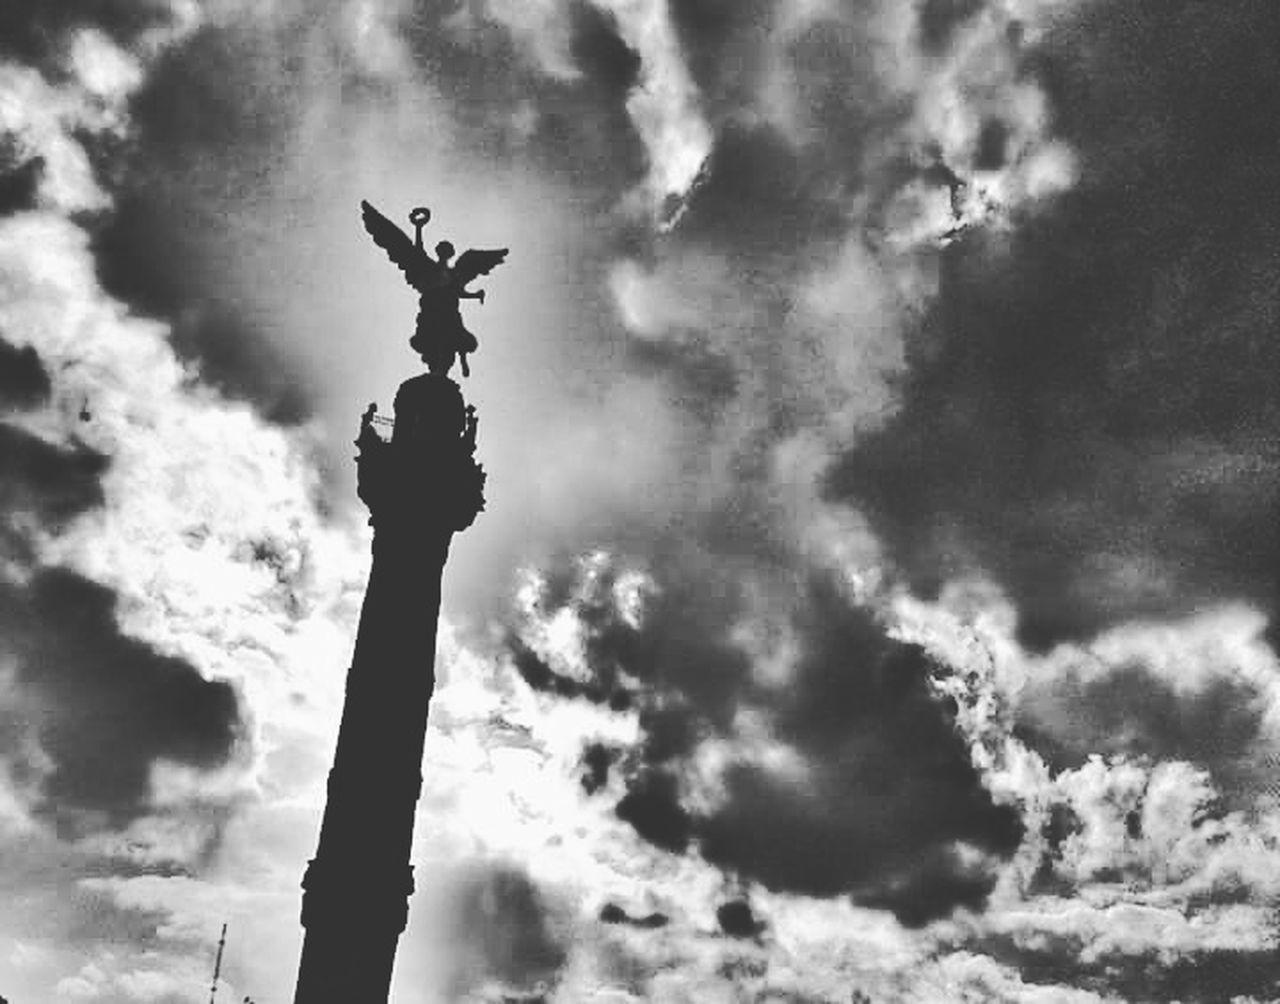 Angel a contraluz Cloud - Sky Sky Cloudy Monument Eye4photography  EyeEm Best Shots Eye4photography  Mexicocity  Cdmx Urban Scene Sculpture Blackandwhite Photography